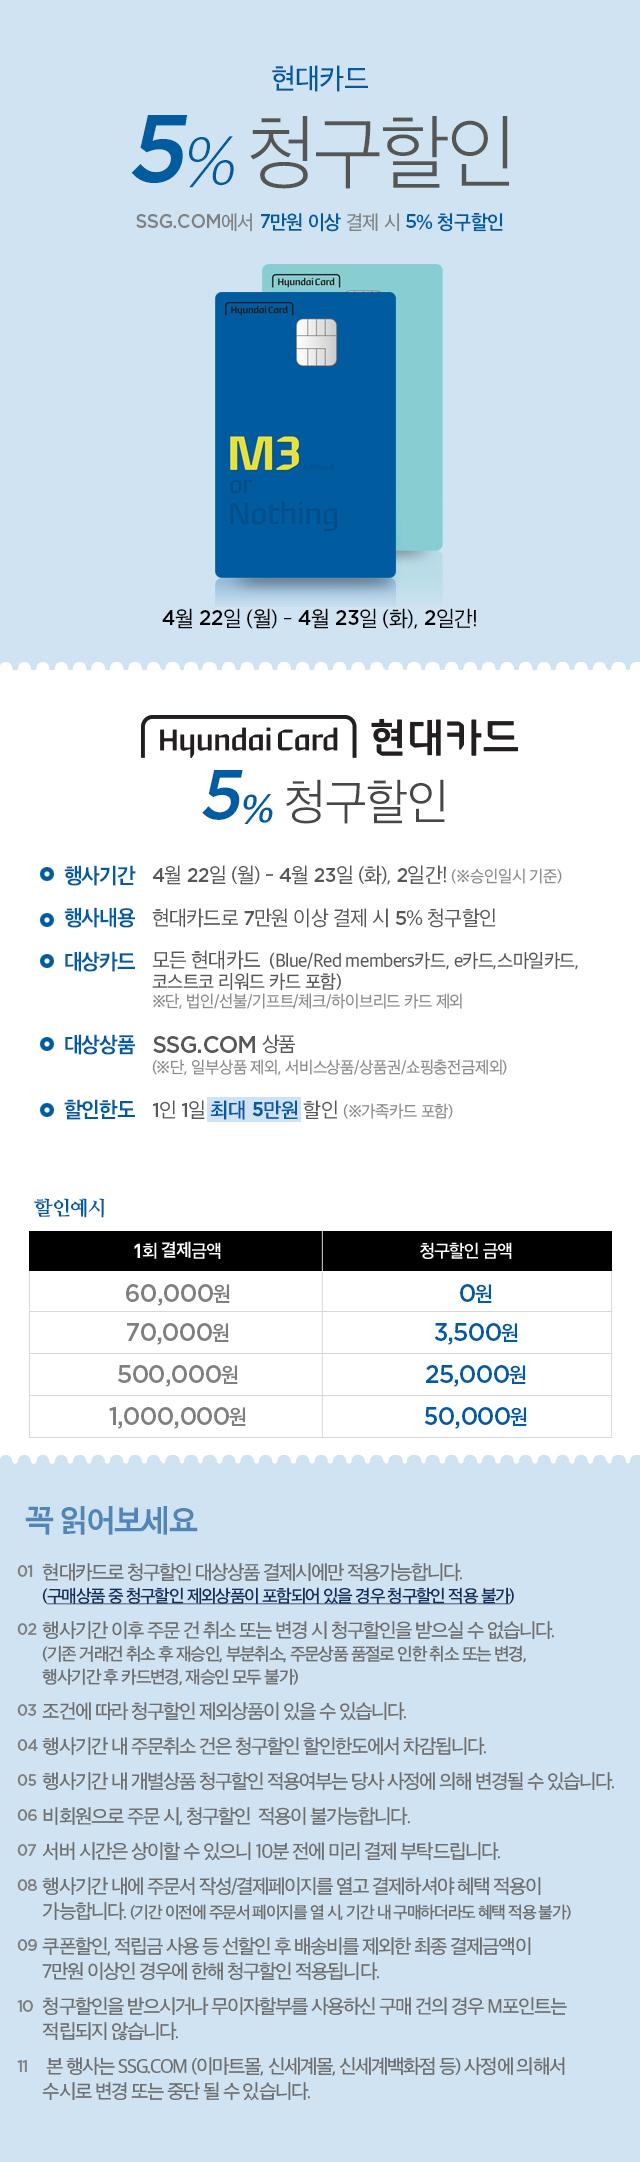 dea7f51e3a5 이벤트&쿠폰 > 현대카드 SSG 5% 청구할인, 신세계몰